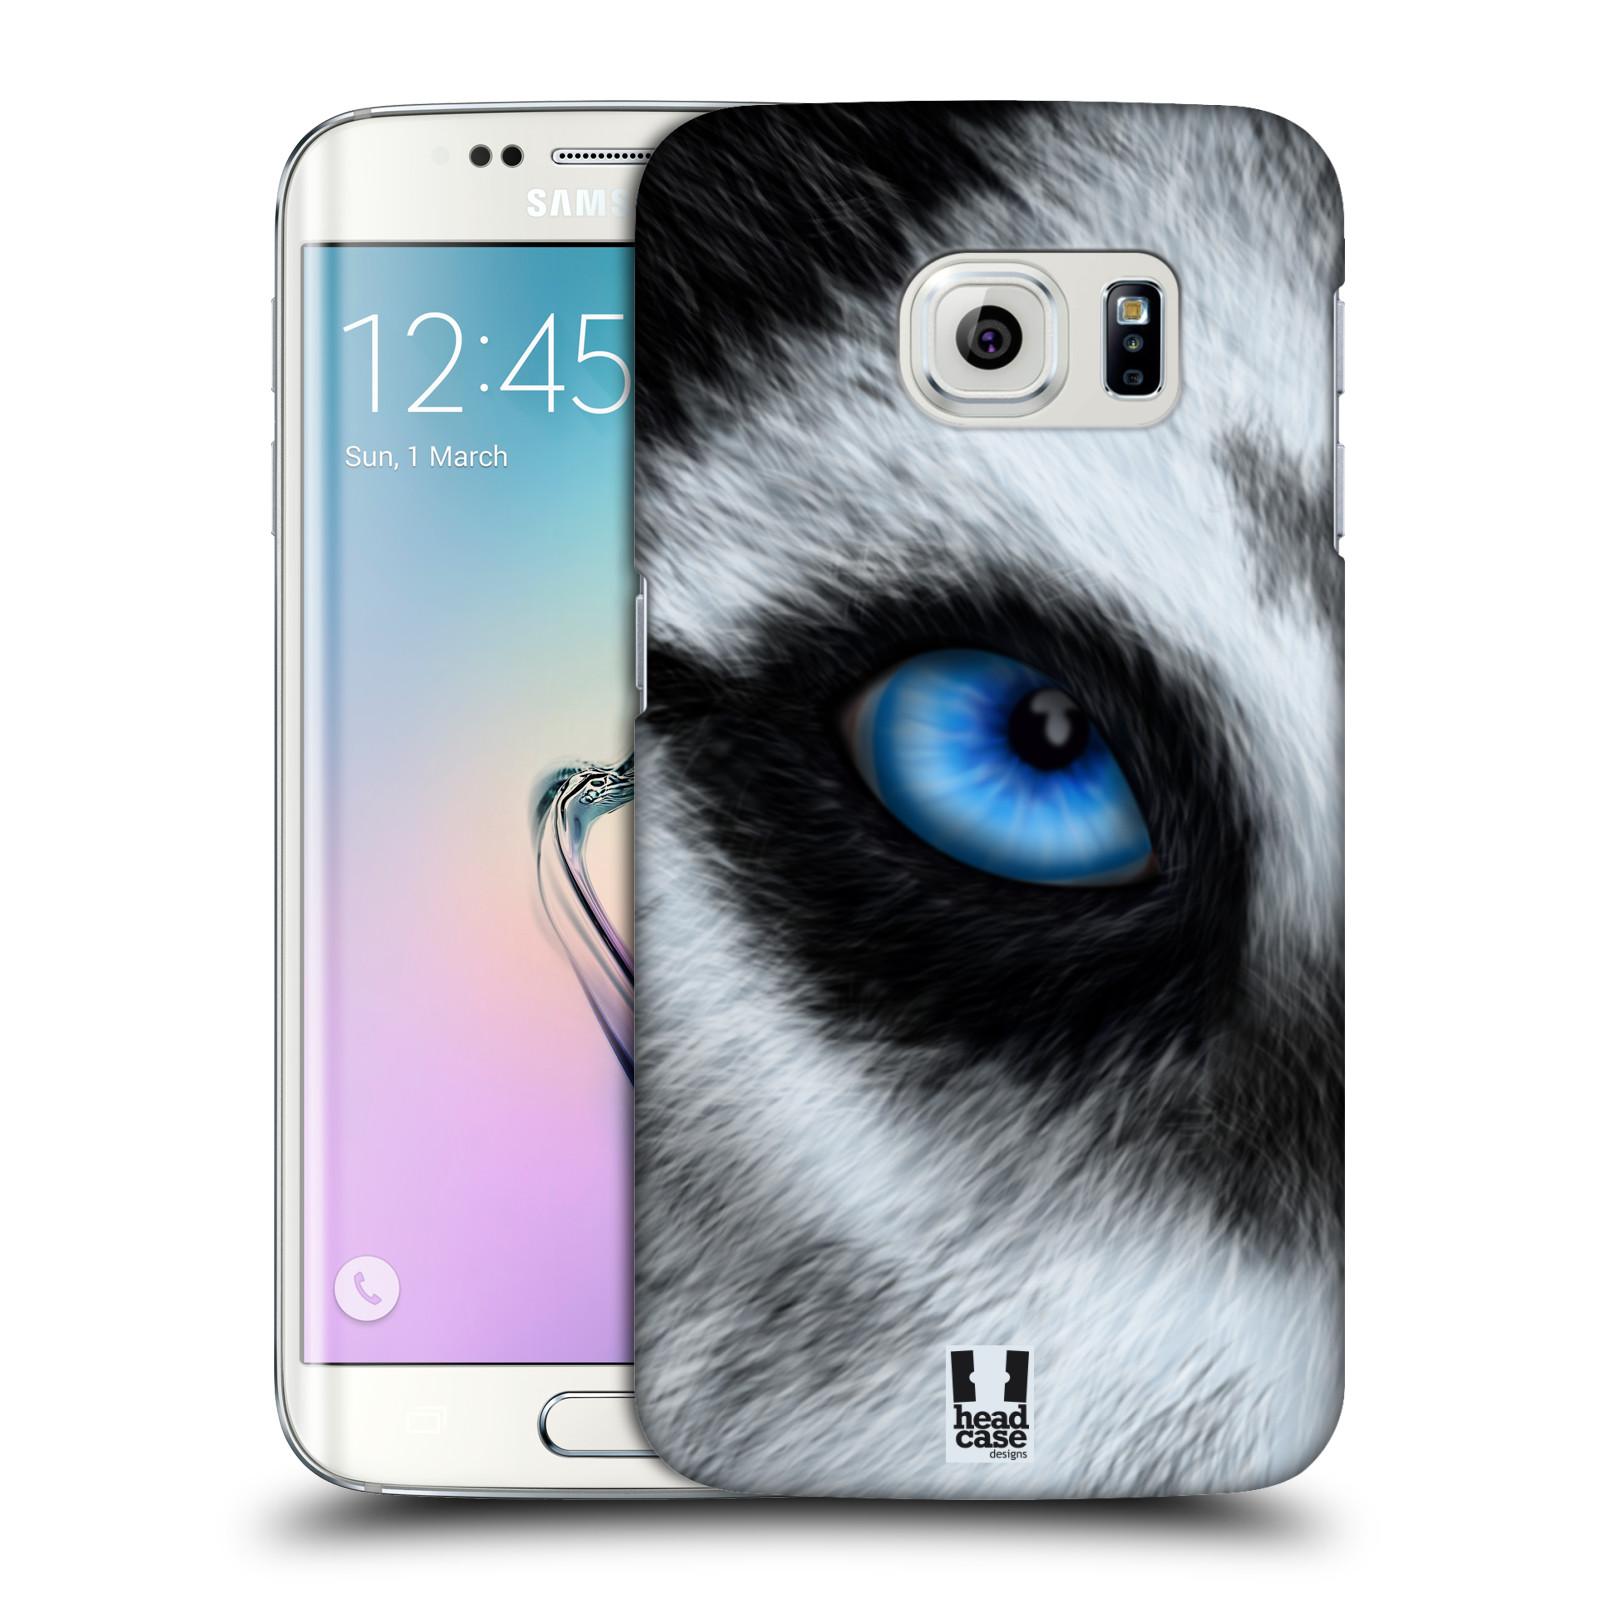 HEAD CASE plastový obal na mobil SAMSUNG Galaxy S6 EDGE (G9250, G925, G925F) vzor pohled zvířete oko pes husky